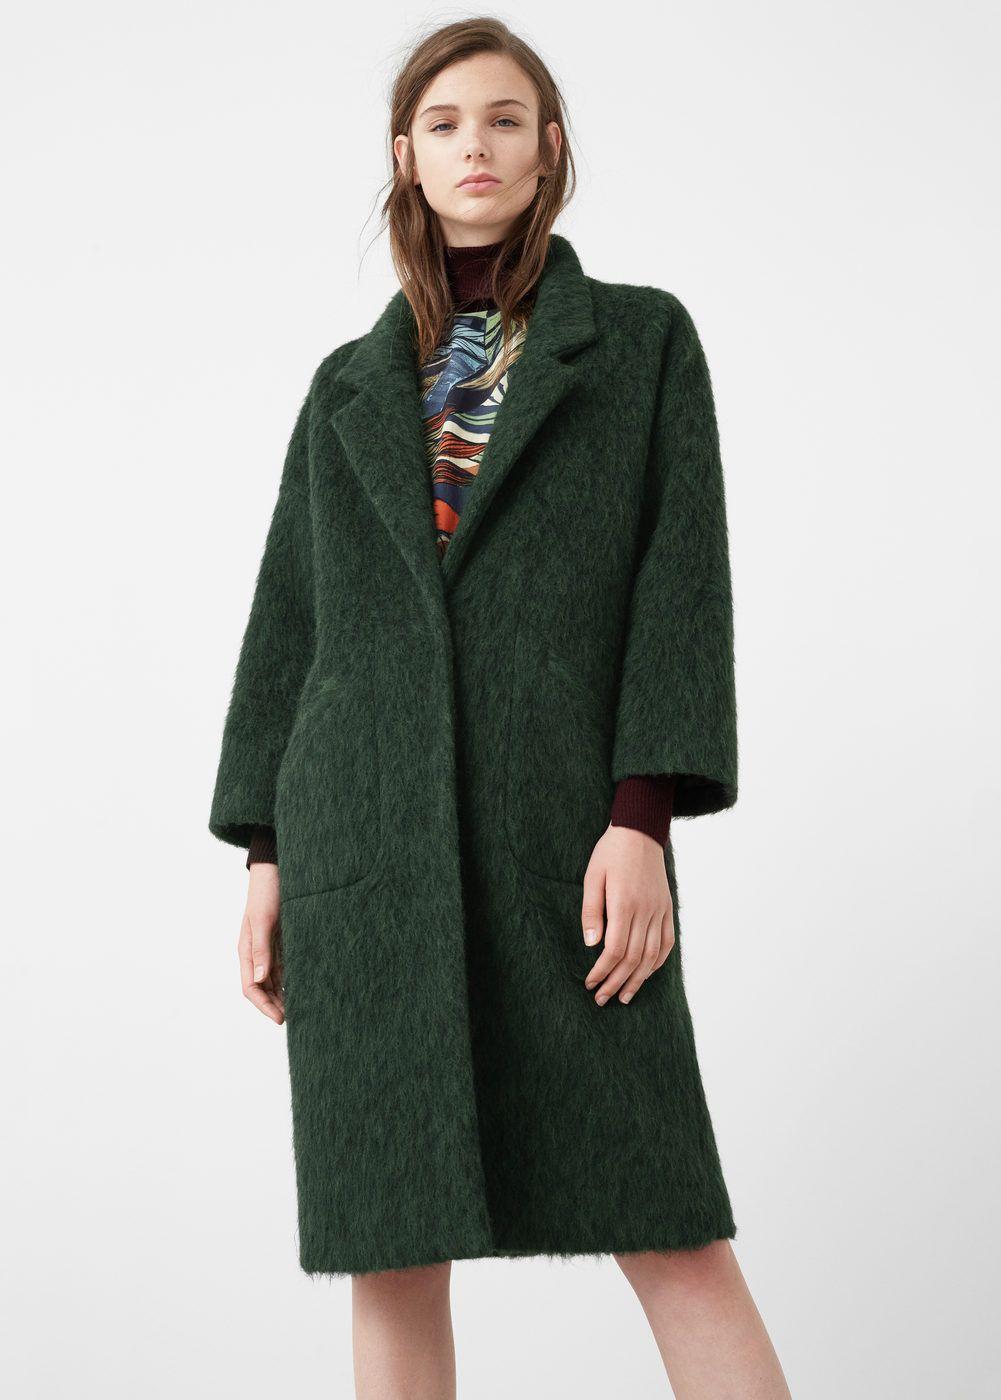 Oversize wool coat - Woman | Mango, Wool coats and Coats for women